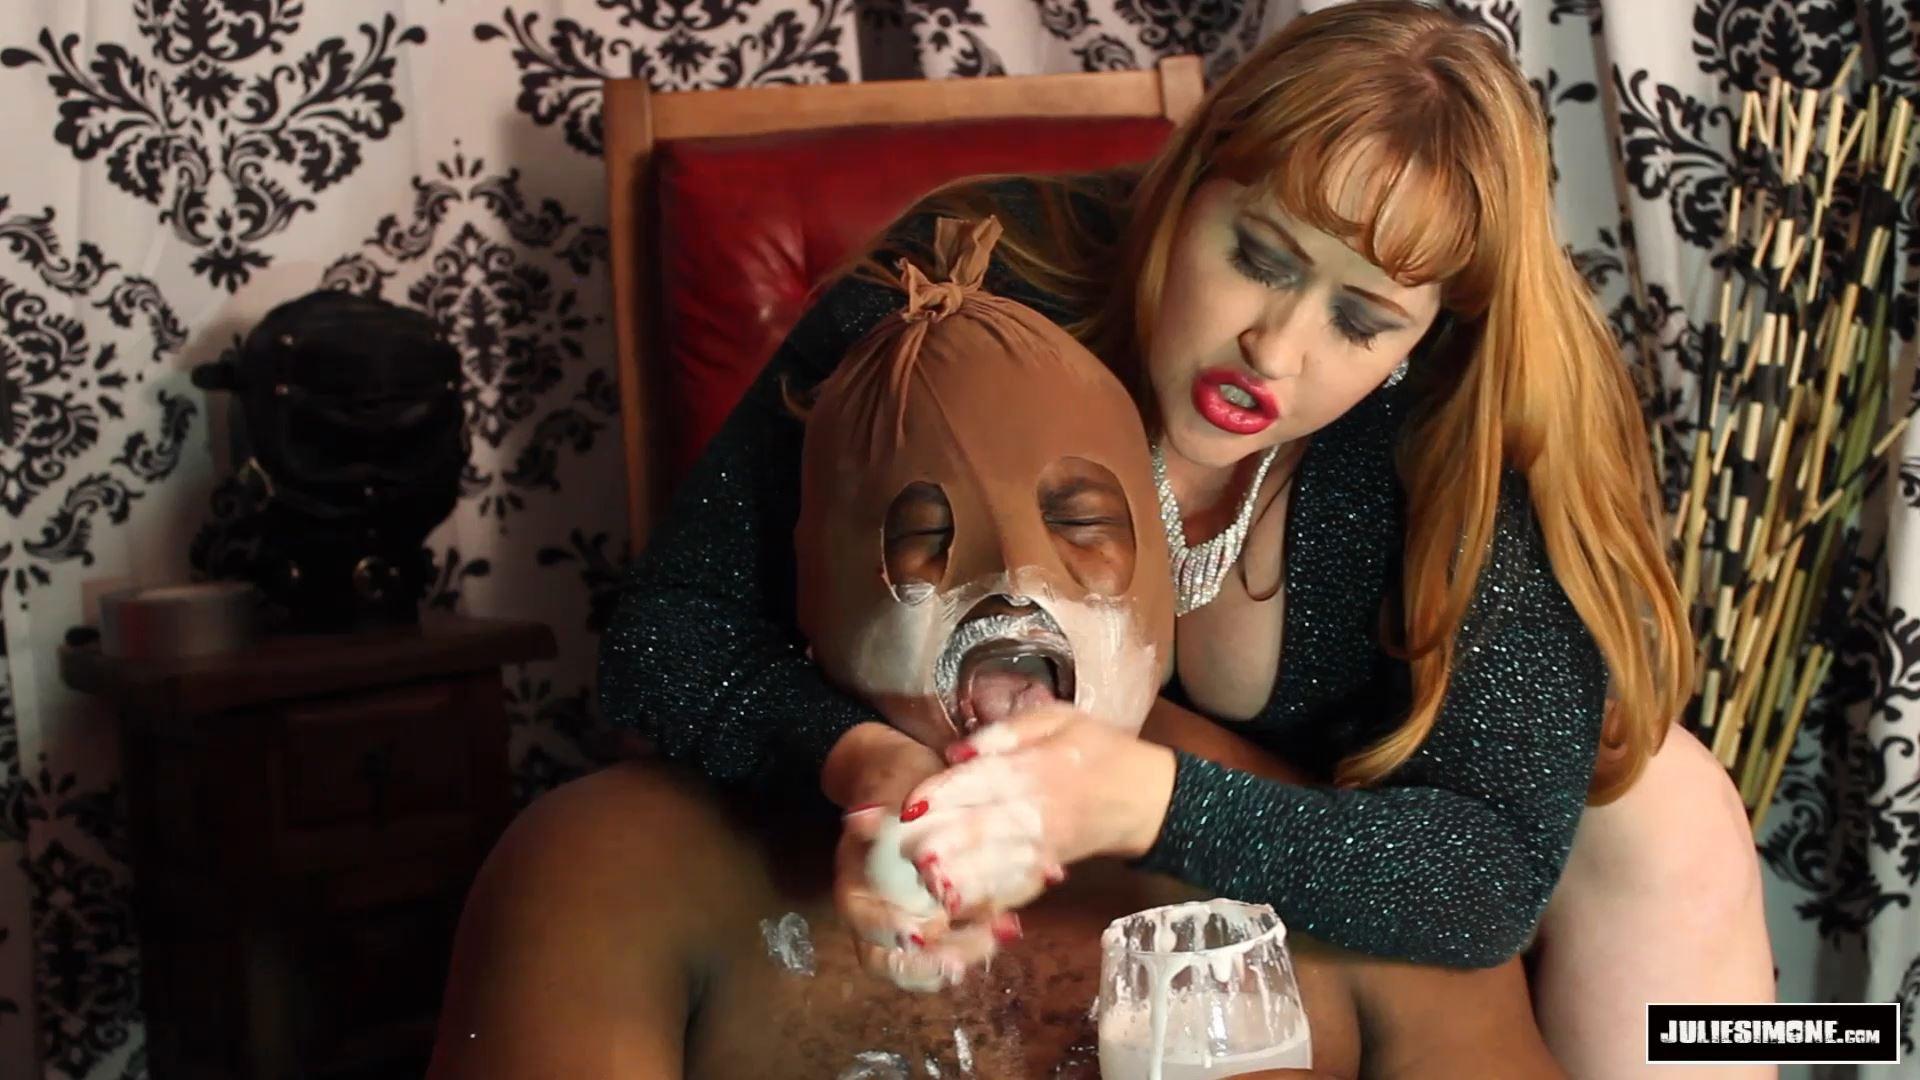 Julie Simone In Scene: Barehanded Soaping Before Worship - JULIESIMONE - FULL HD/1080p/MP4